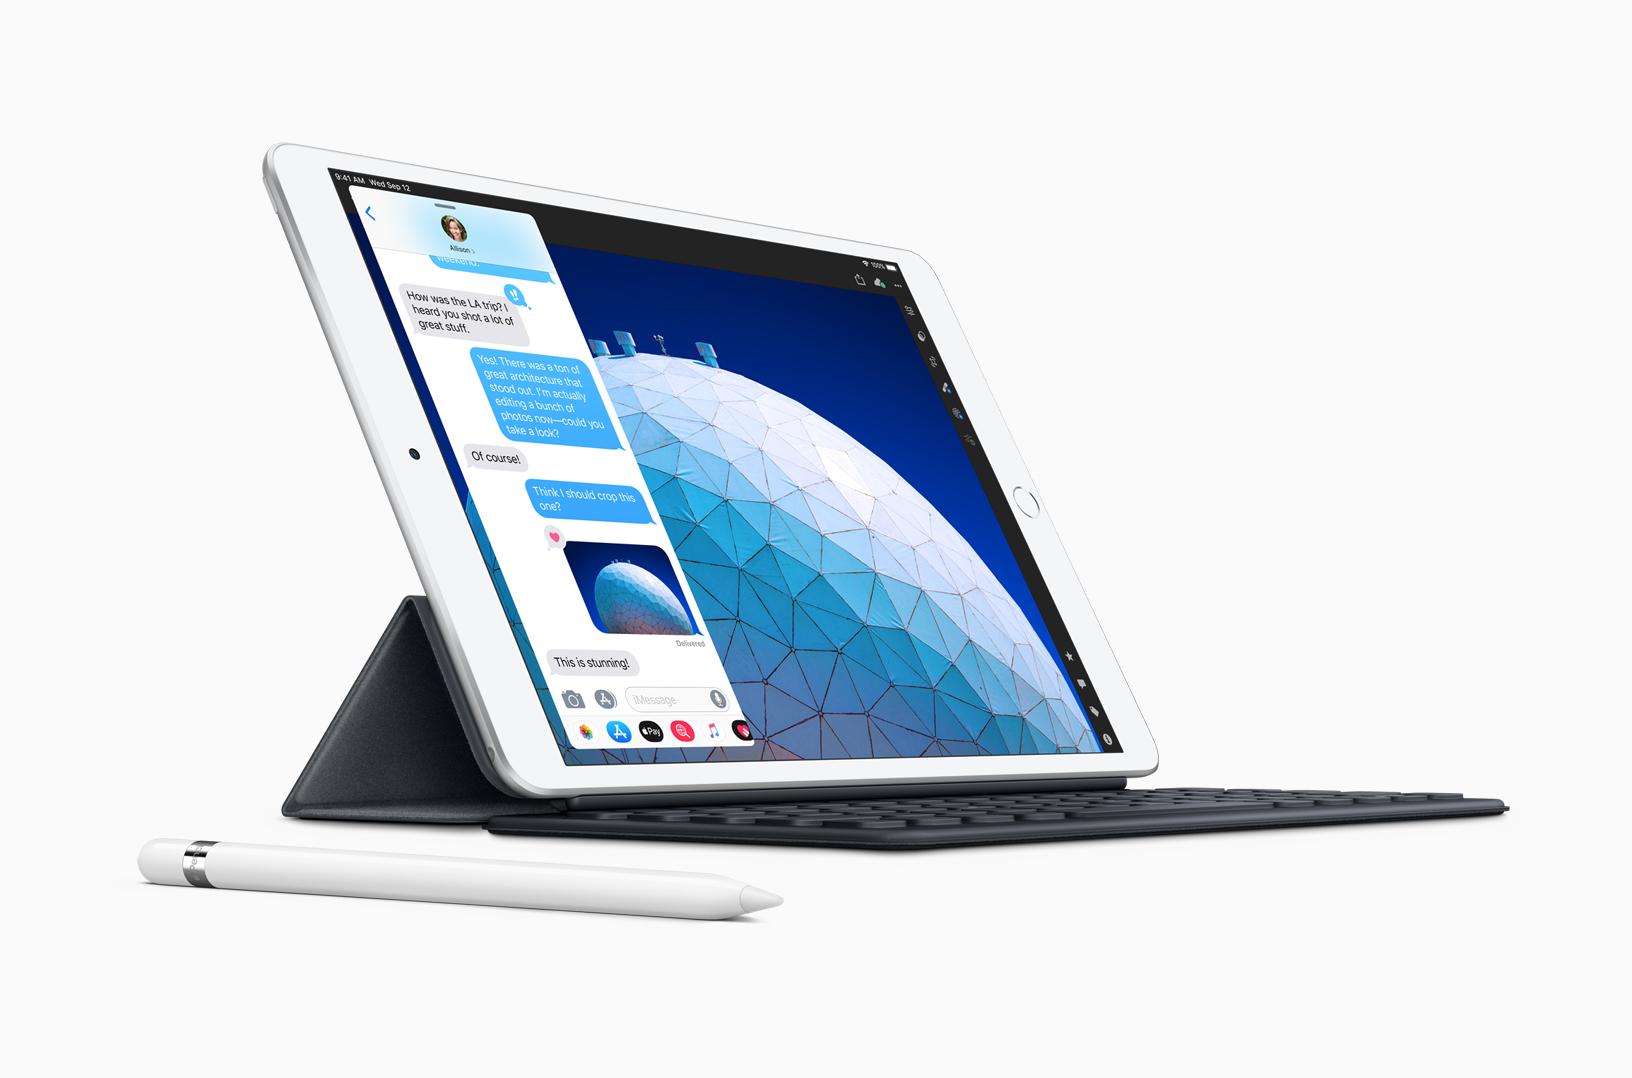 New iPad Air smart keyboard with apple pencil